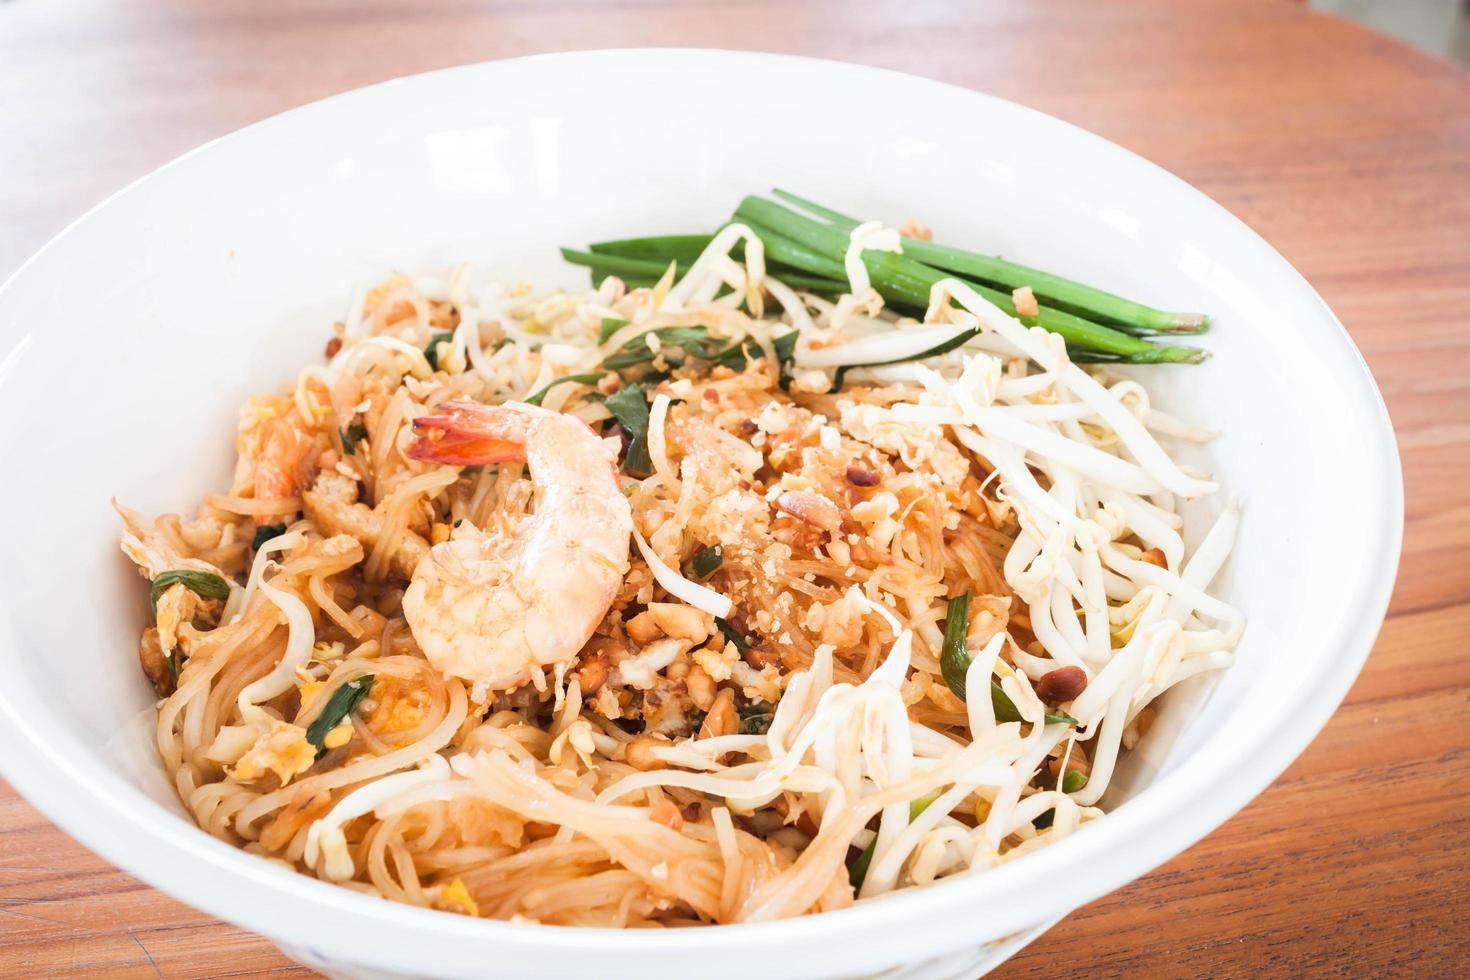 Bowl of pad thai photo